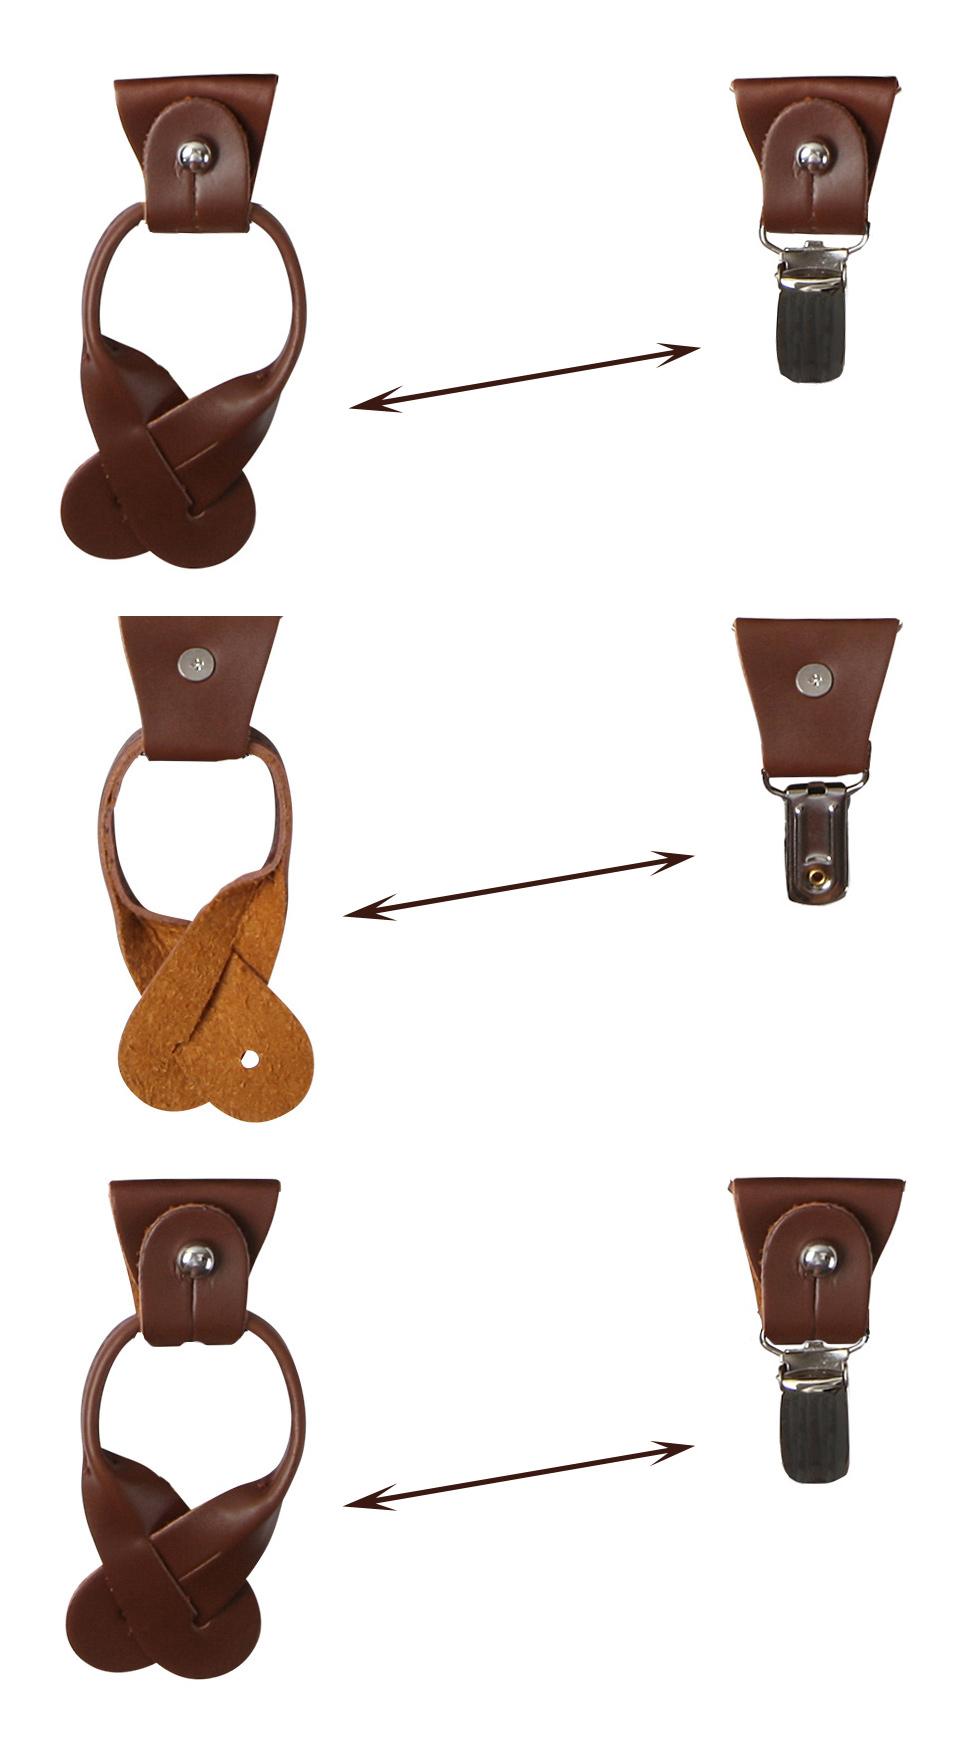 Jacob-Alexander-Matching-Polka-Dot-Suspenders-Handkerchief-and-Bow-Tie thumbnail 7